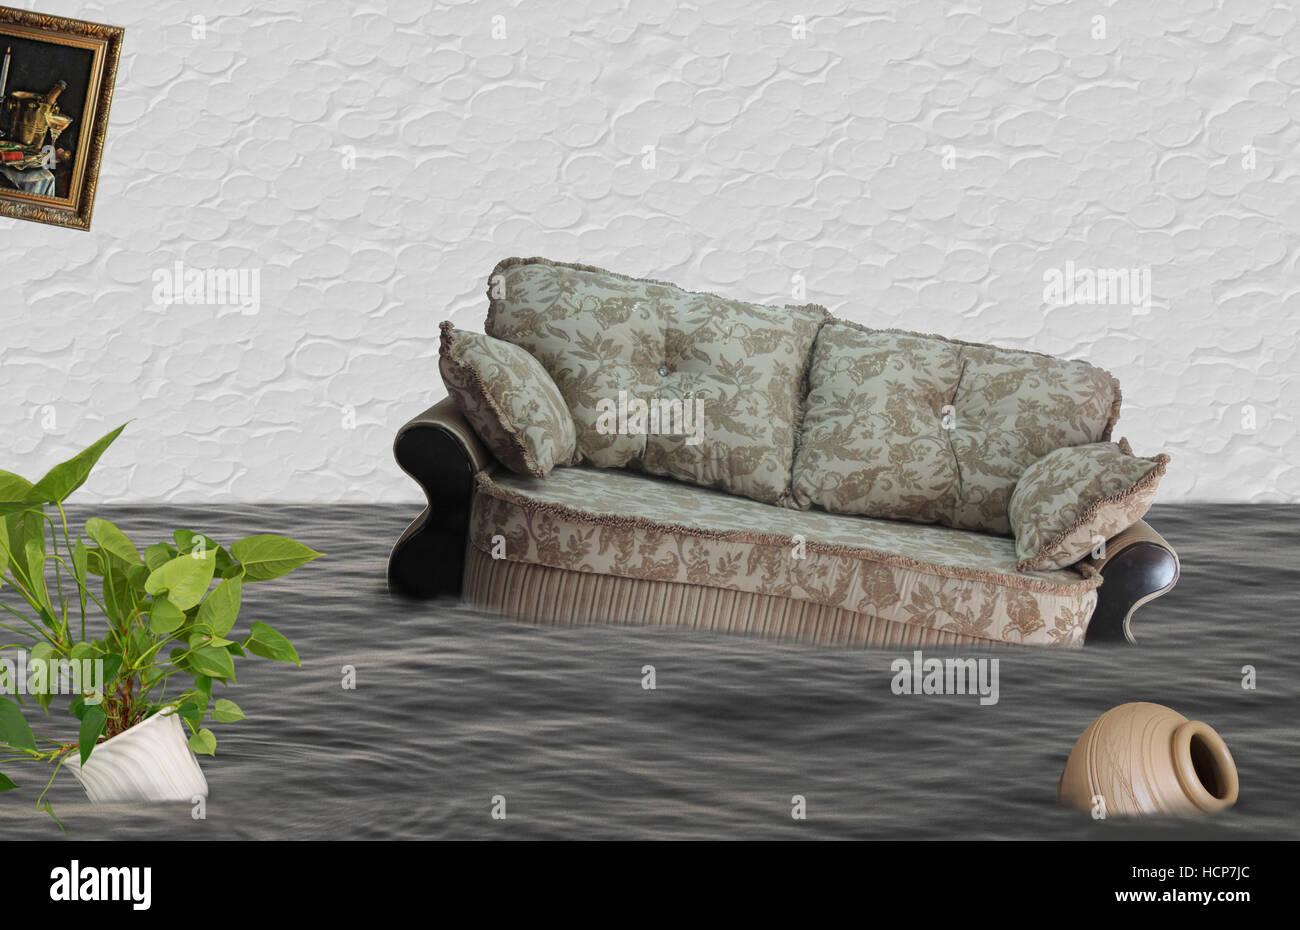 Flood, insurance damage, household items, home insurance, home insurance, house under water, natural disaster - Stock Image